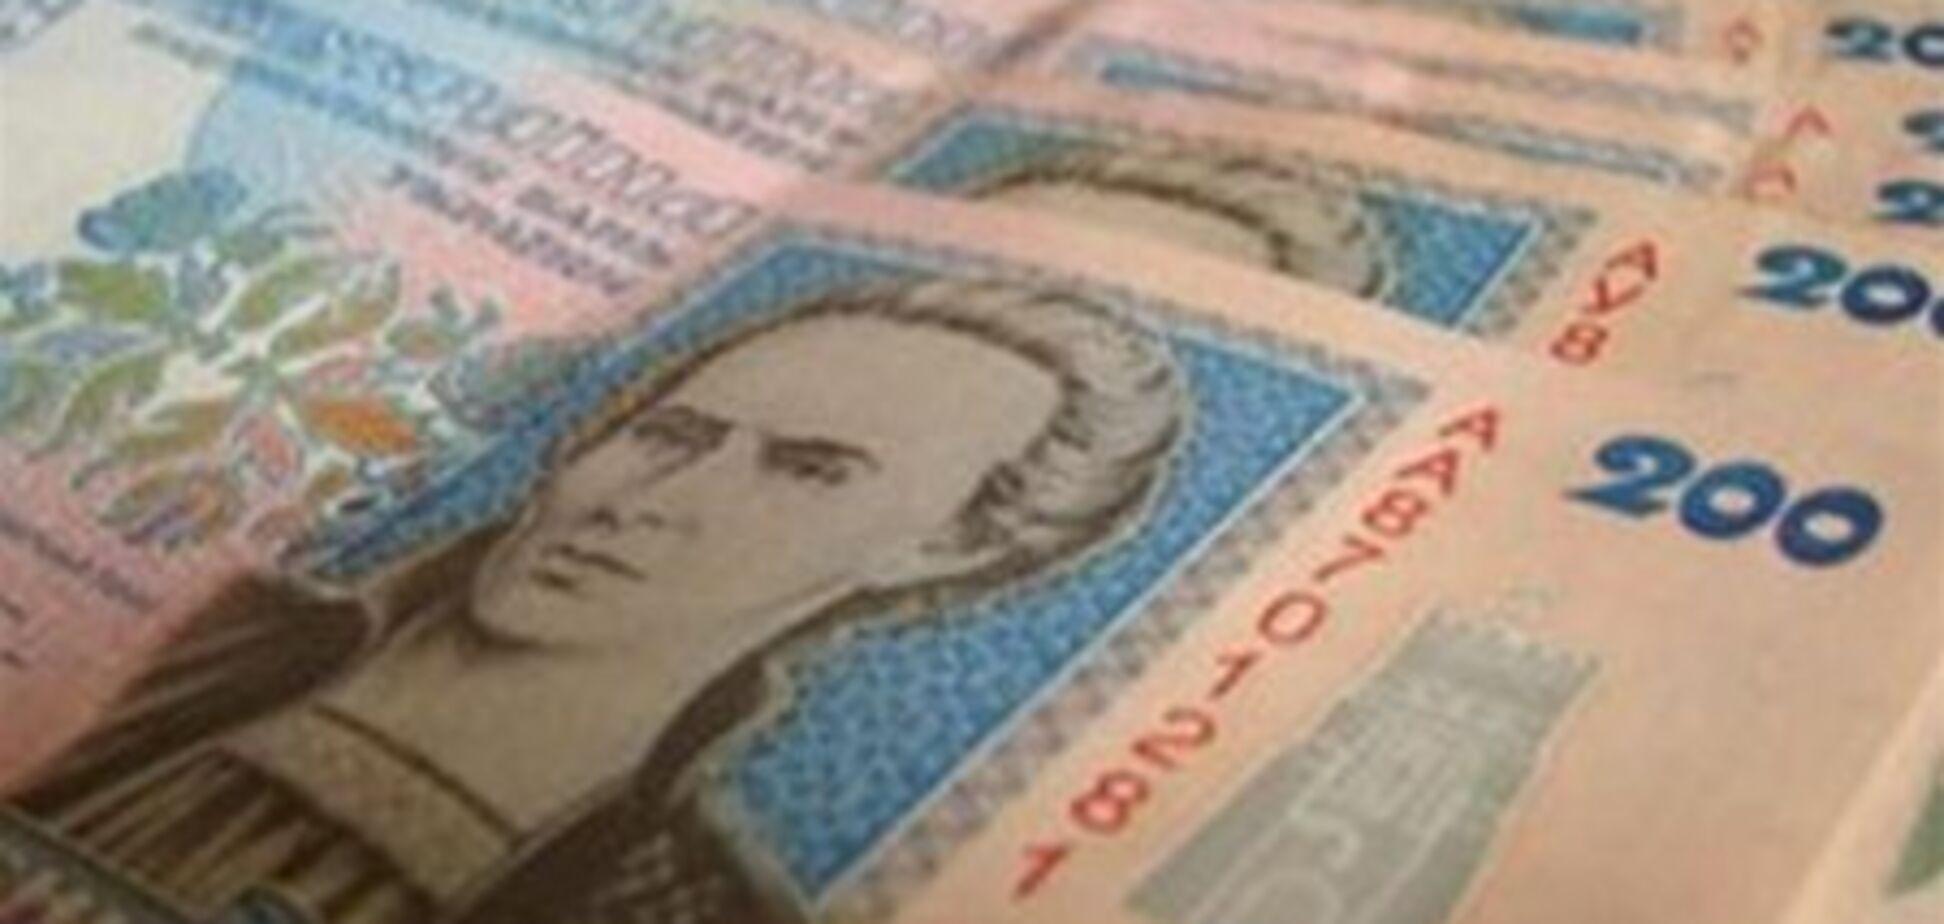 На Полтавщине два депутата присвоили себе более 1 млн грн